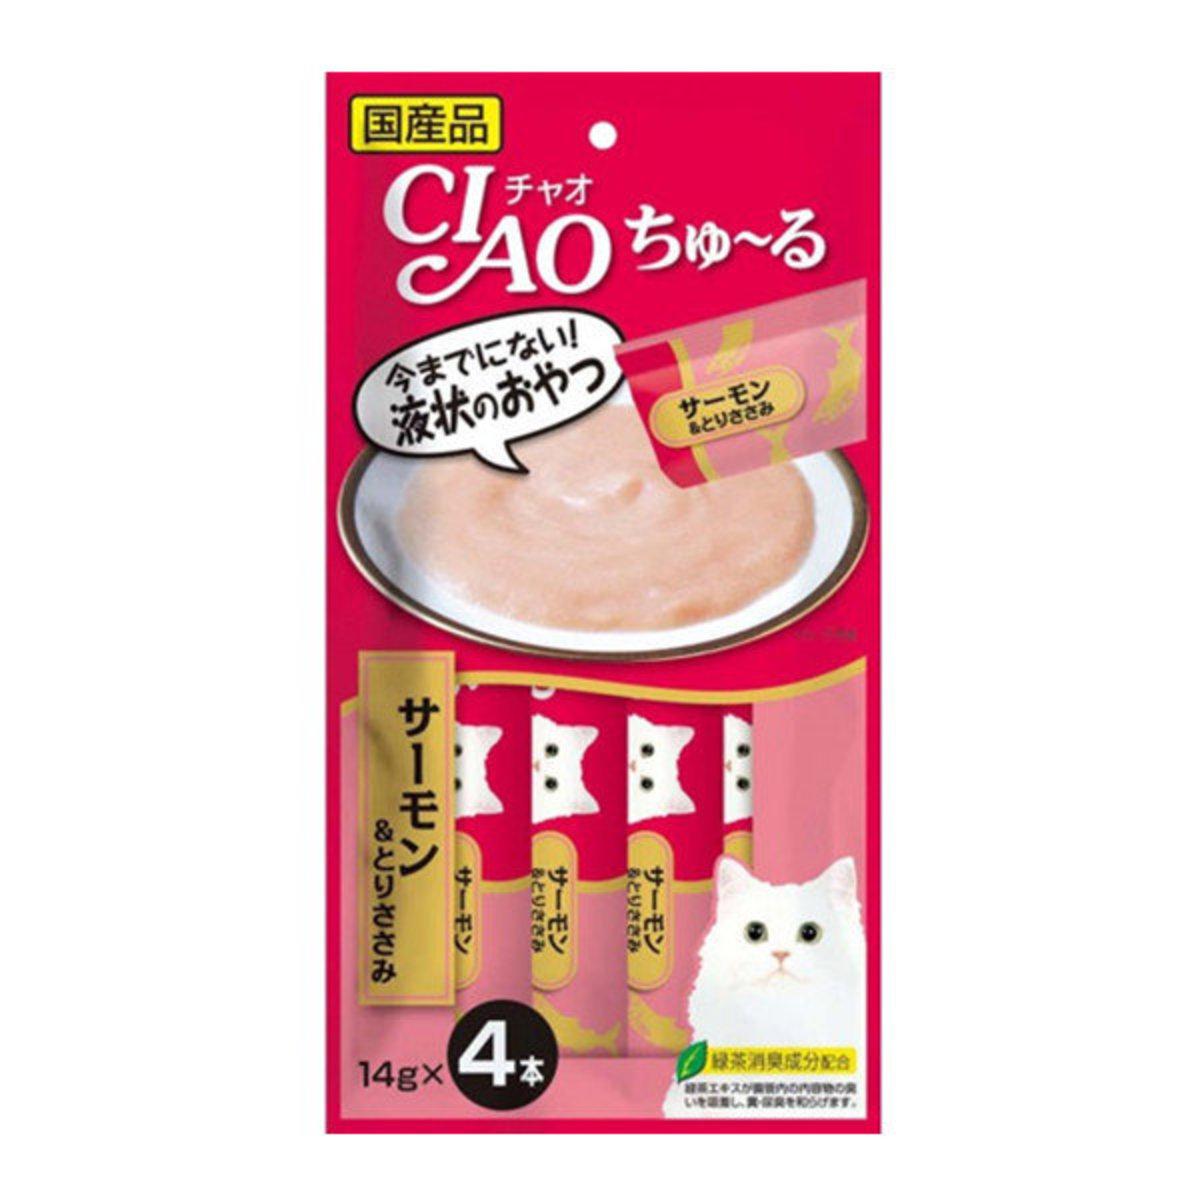 CIAO Churu Chicken & Salmon Puree (14g x 4) #SC-146